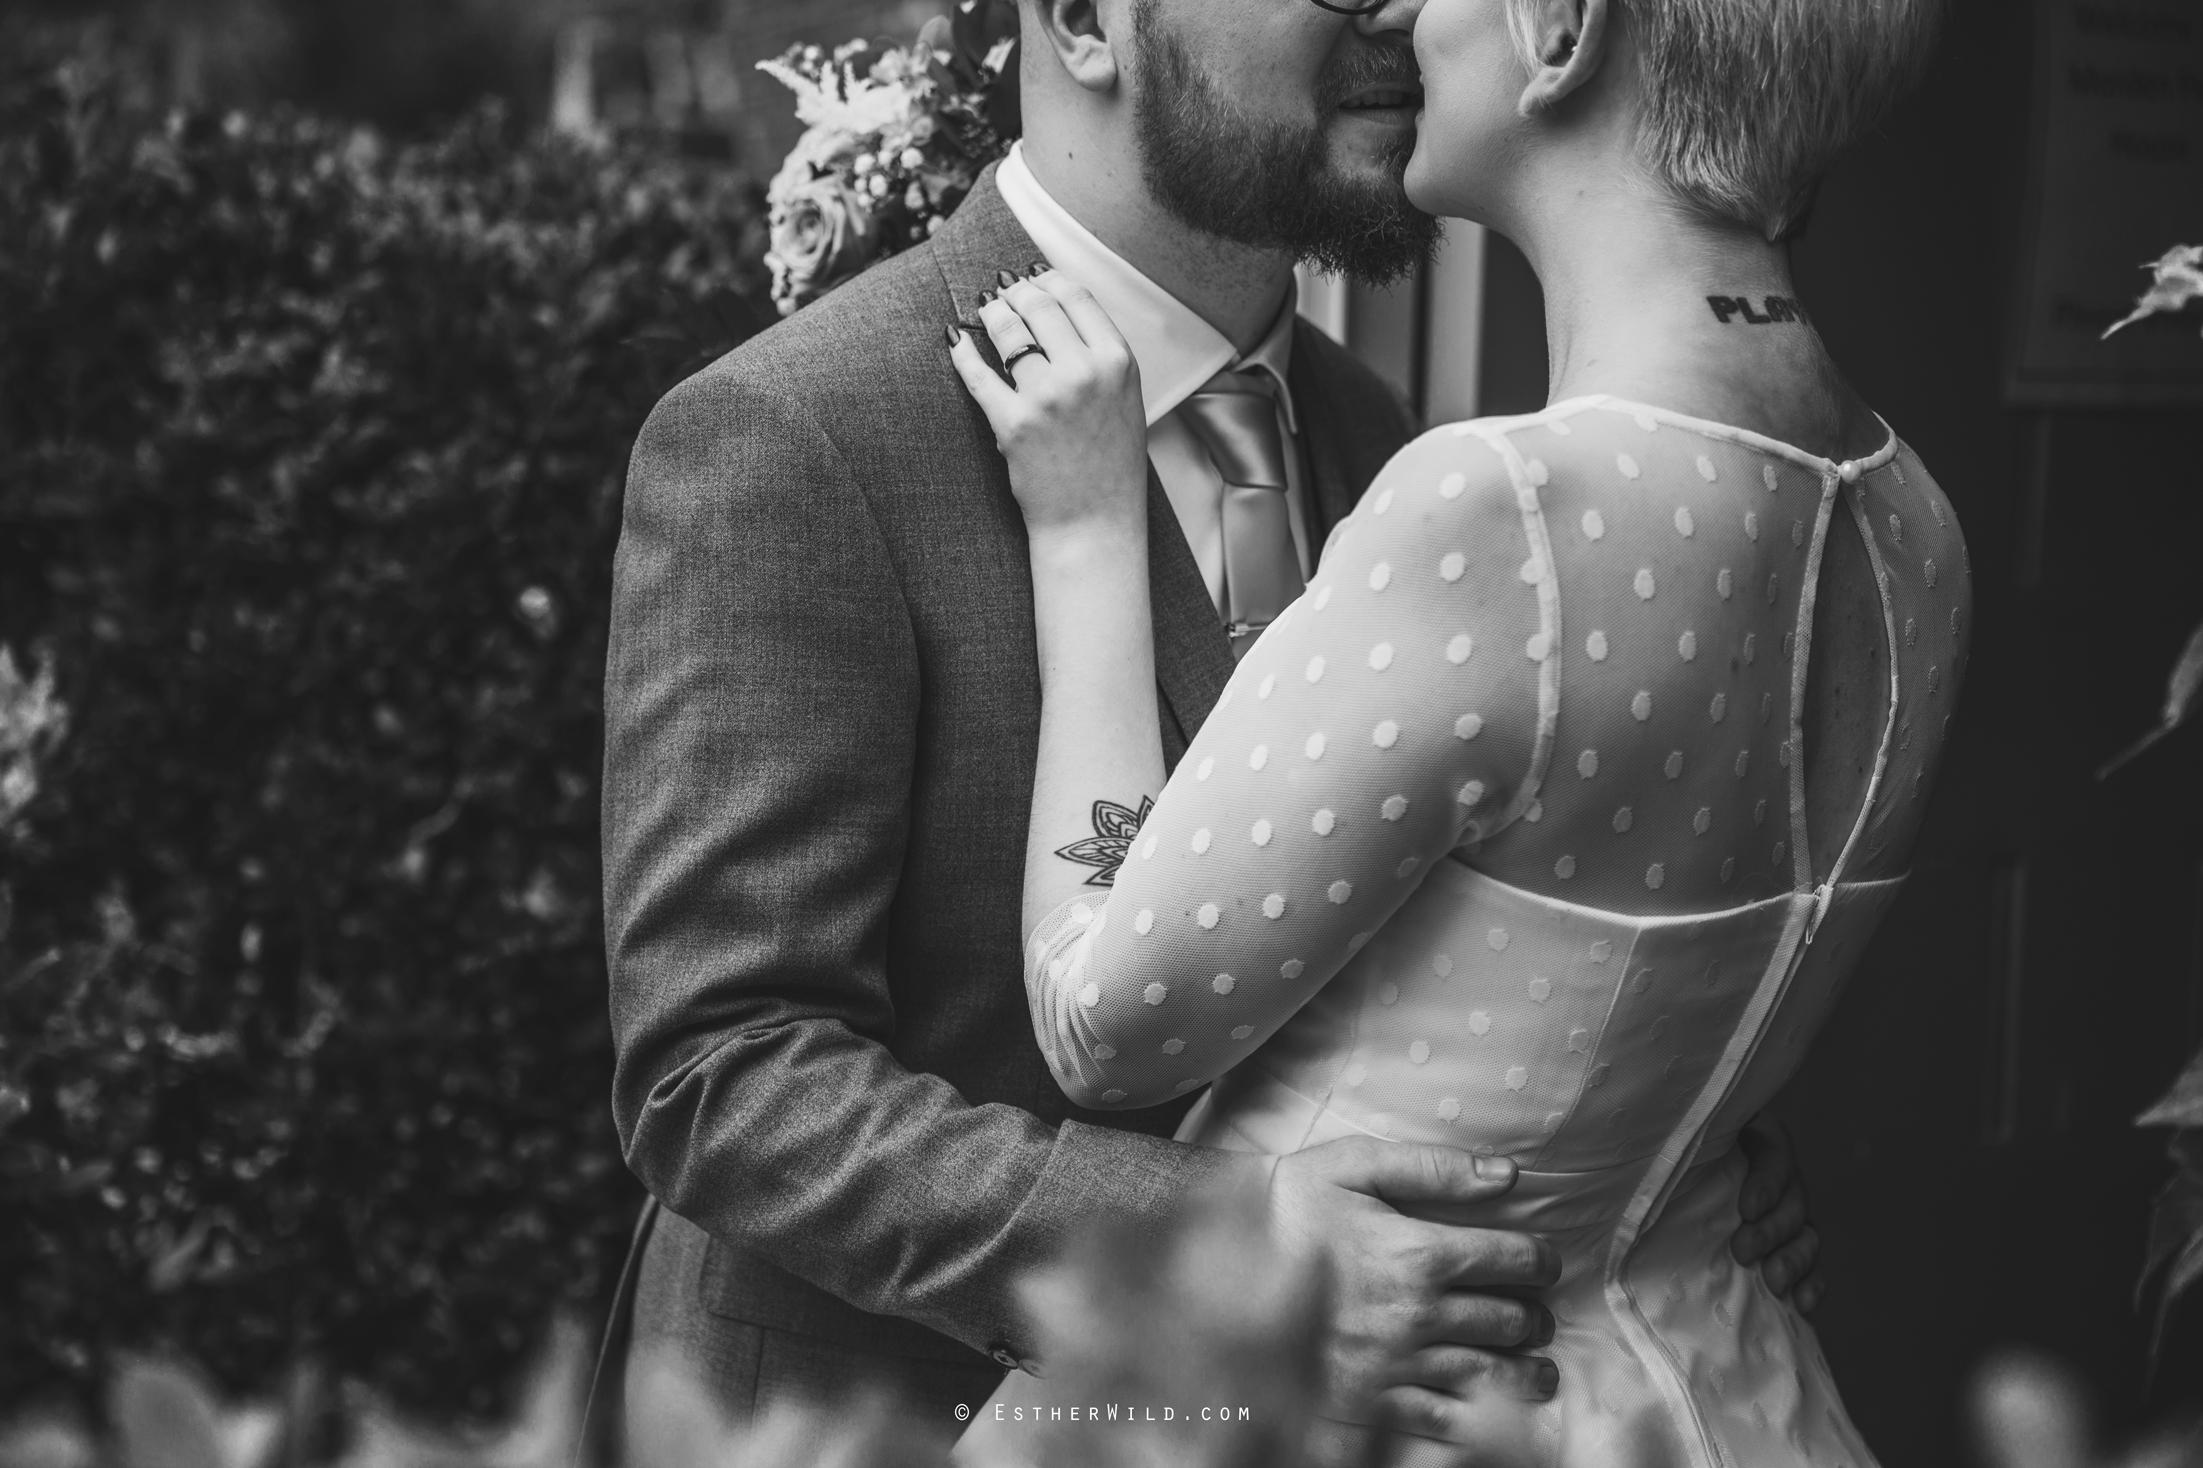 0617_London_Croydon_Clapham_Wedding_Photographer_Esther_Wild_Photography_IMG_5651-1.jpg